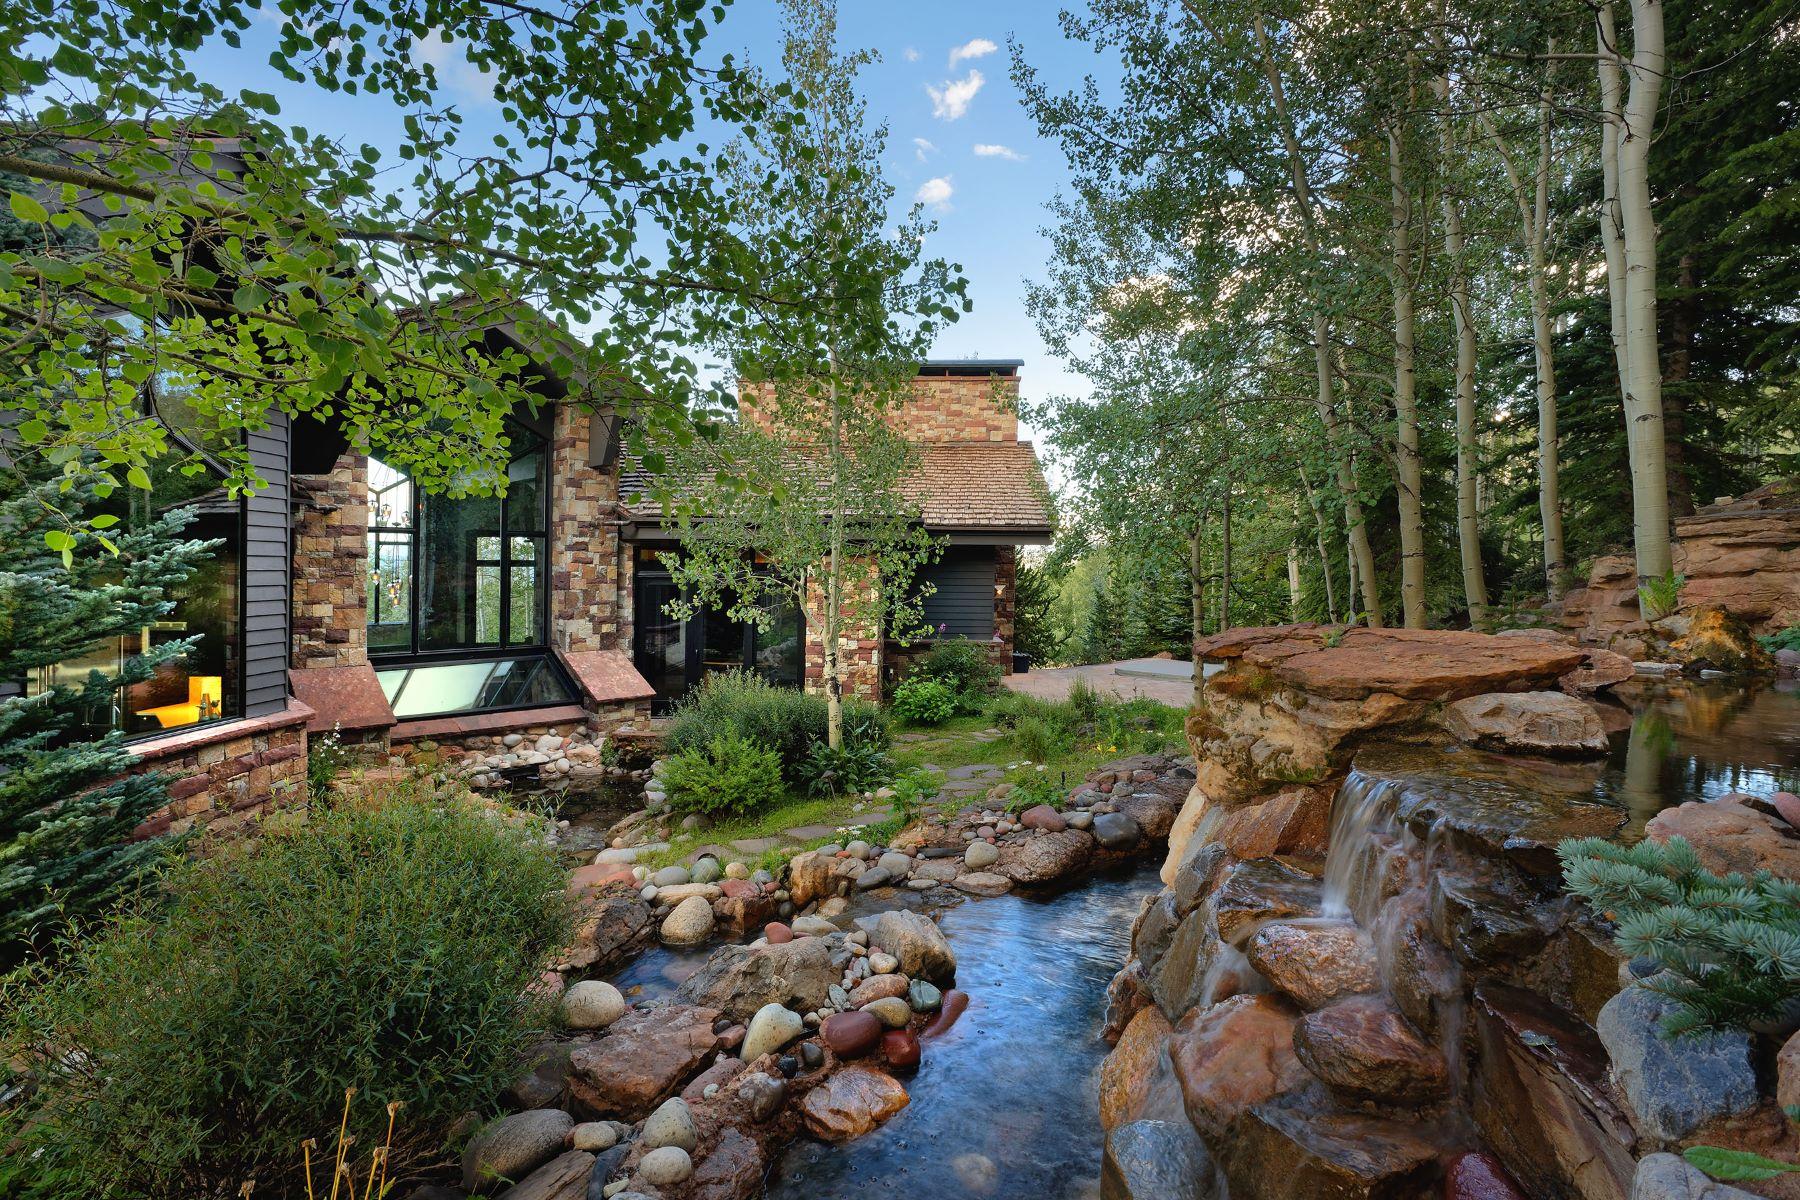 530 Divide Drive 530 Divide Drive Snowmass Village, Colorado 81615 Amerika Birleşik Devletleri